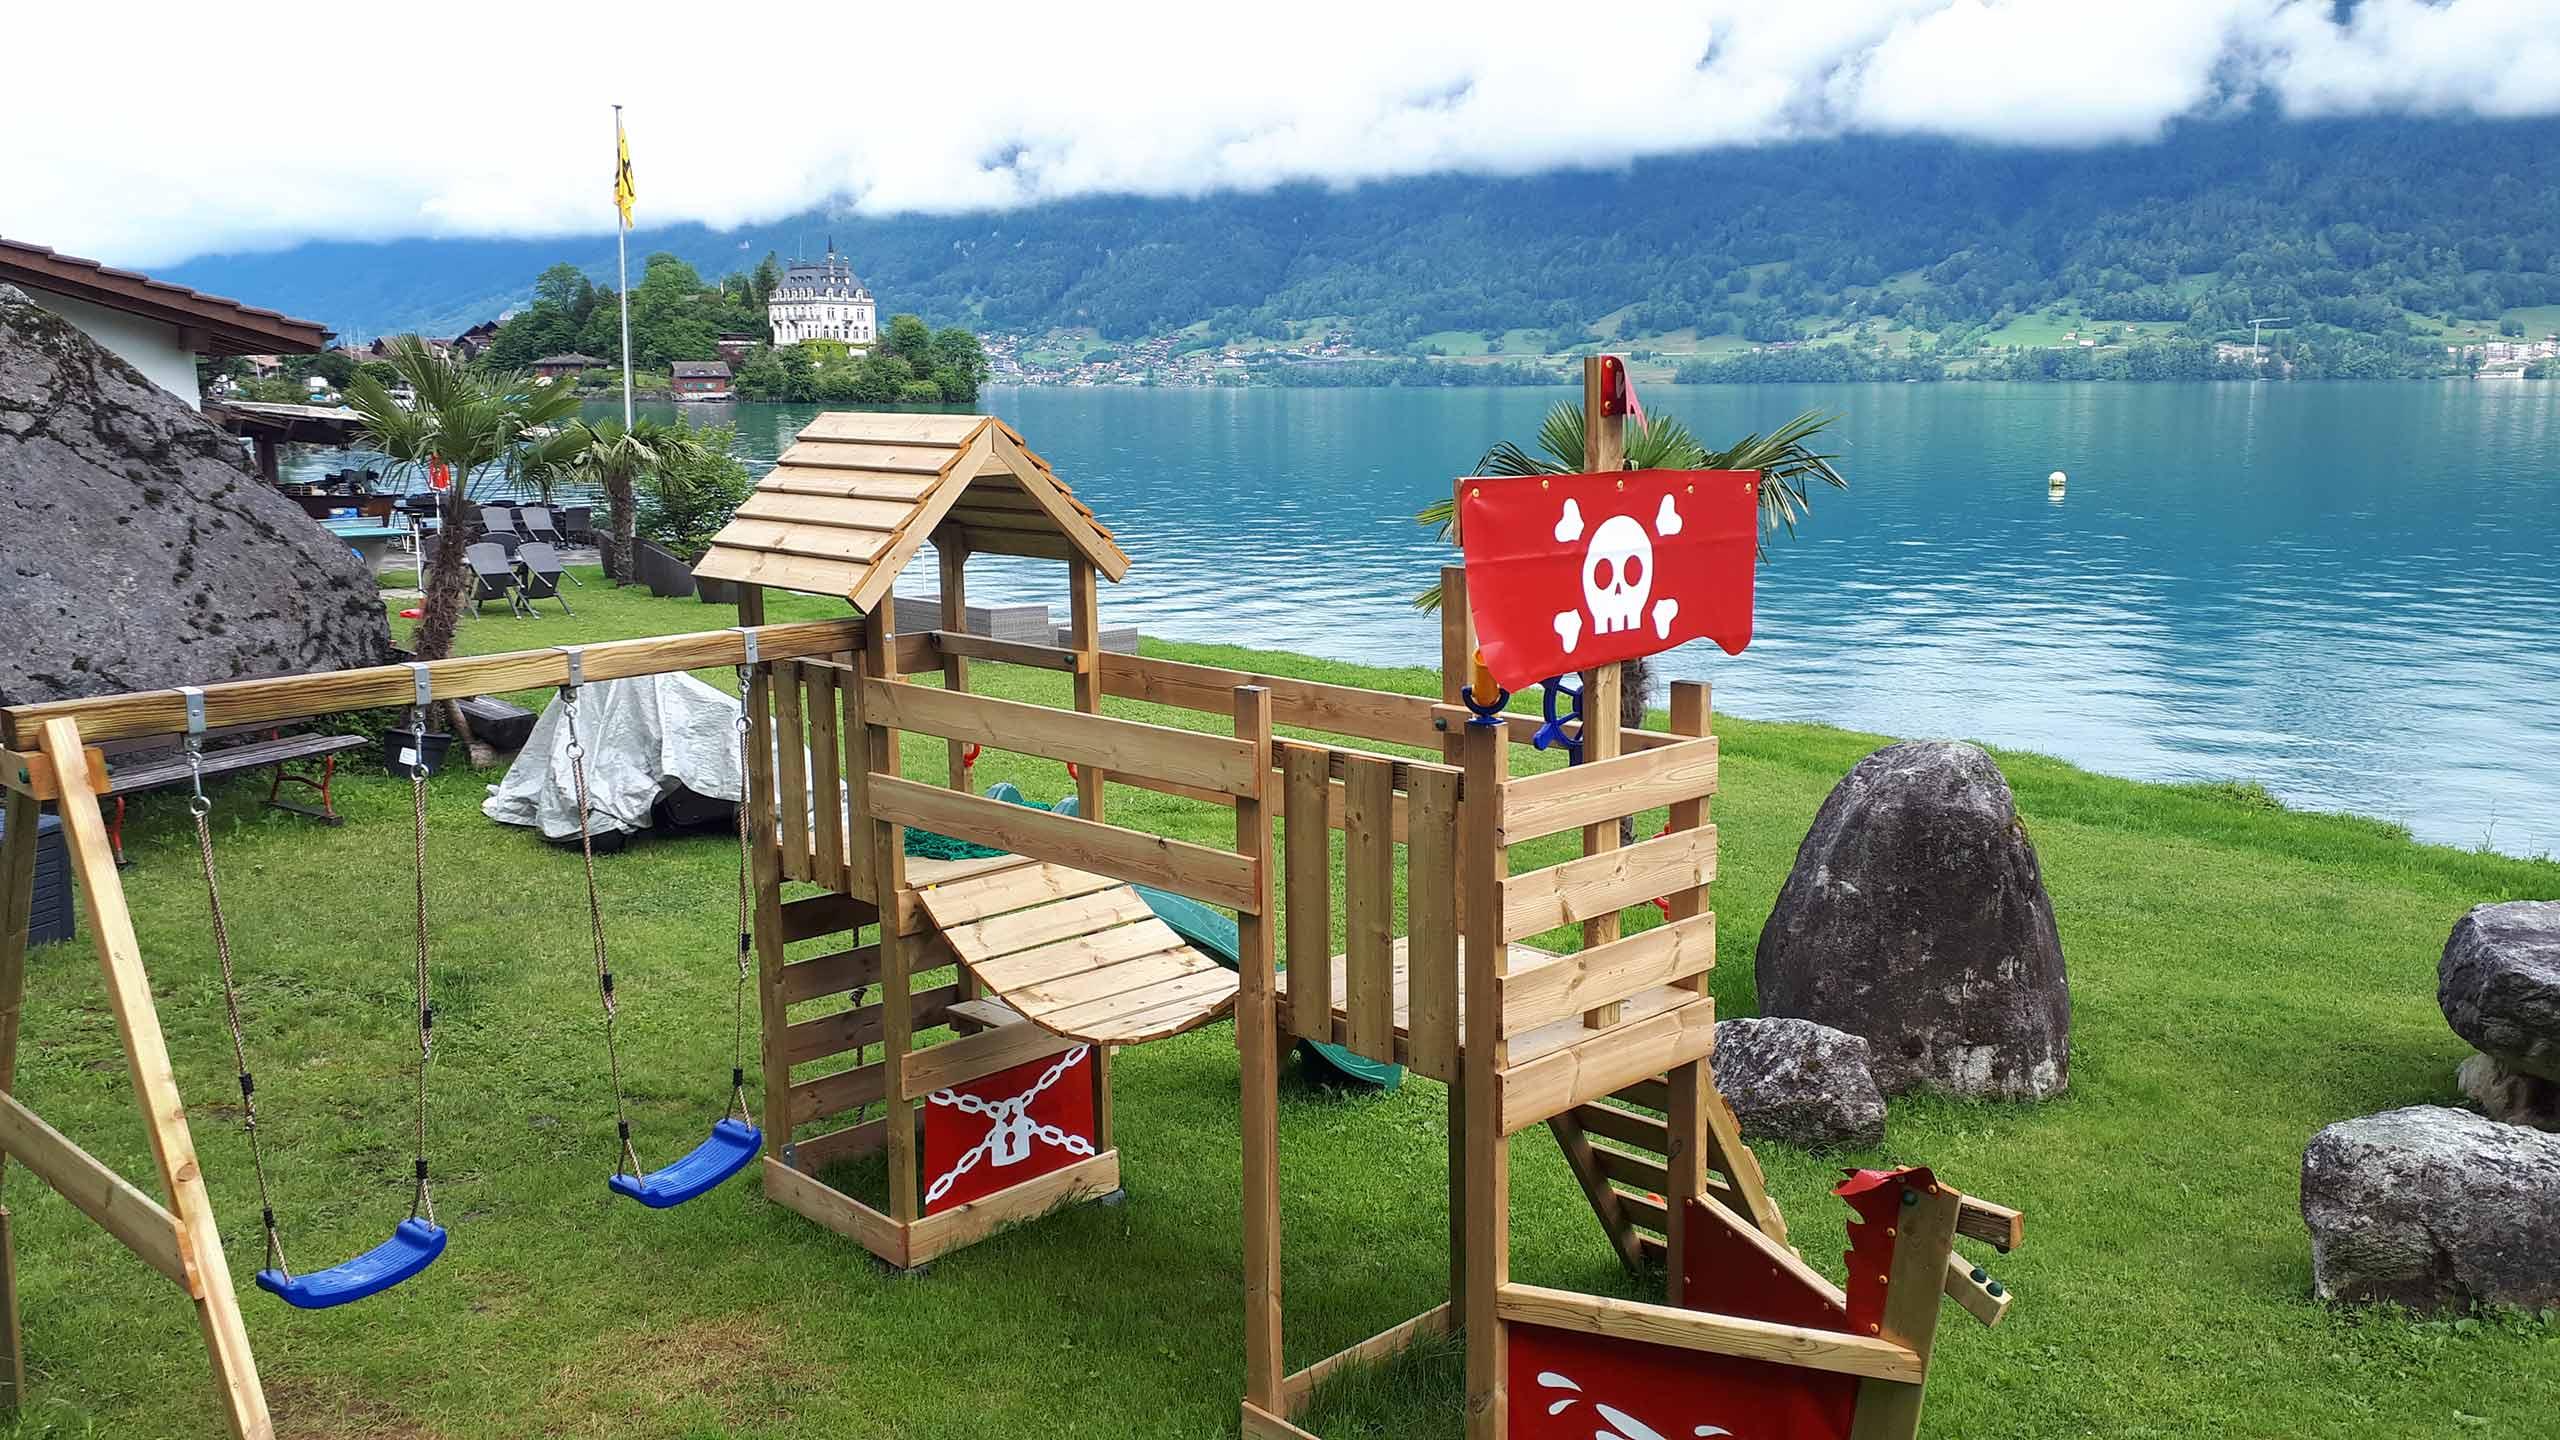 iseltwald-strandbad-schaukeln-kinderspielplatz.jpg